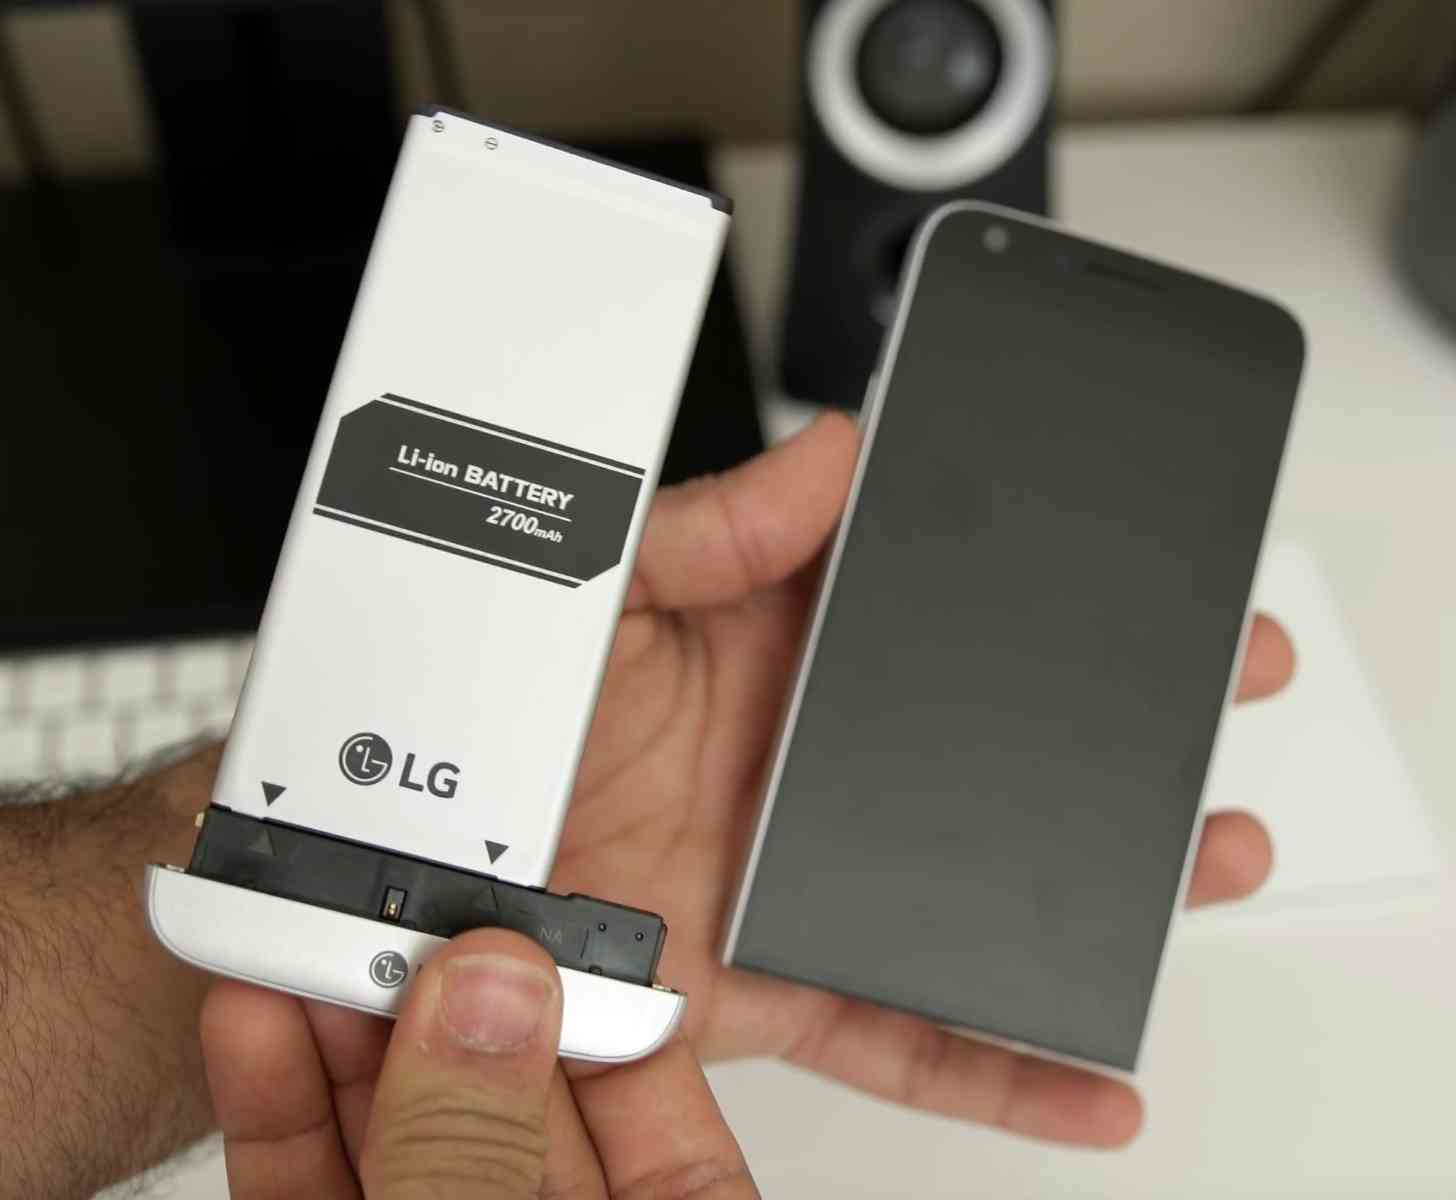 LG G5 battery module